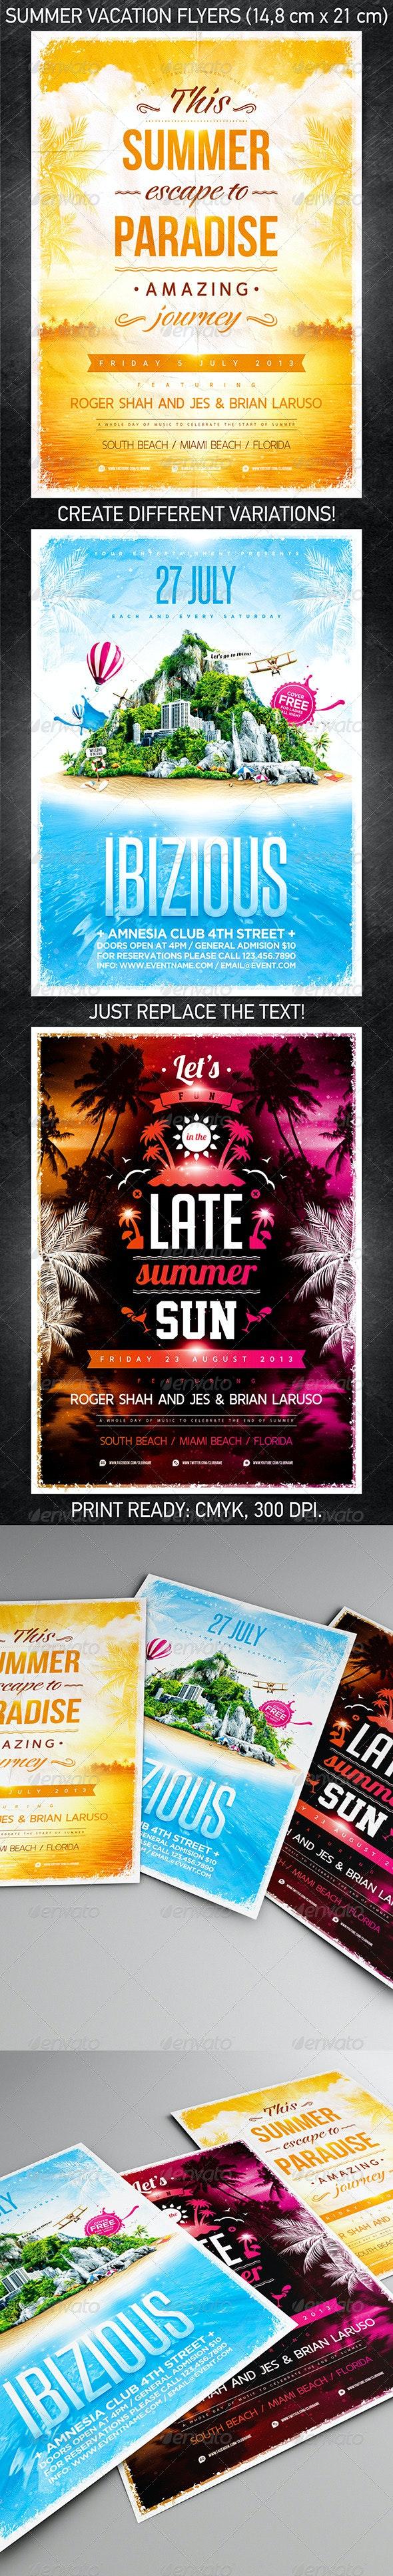 Summer Vacation Flyer Bundle - Flyers Print Templates